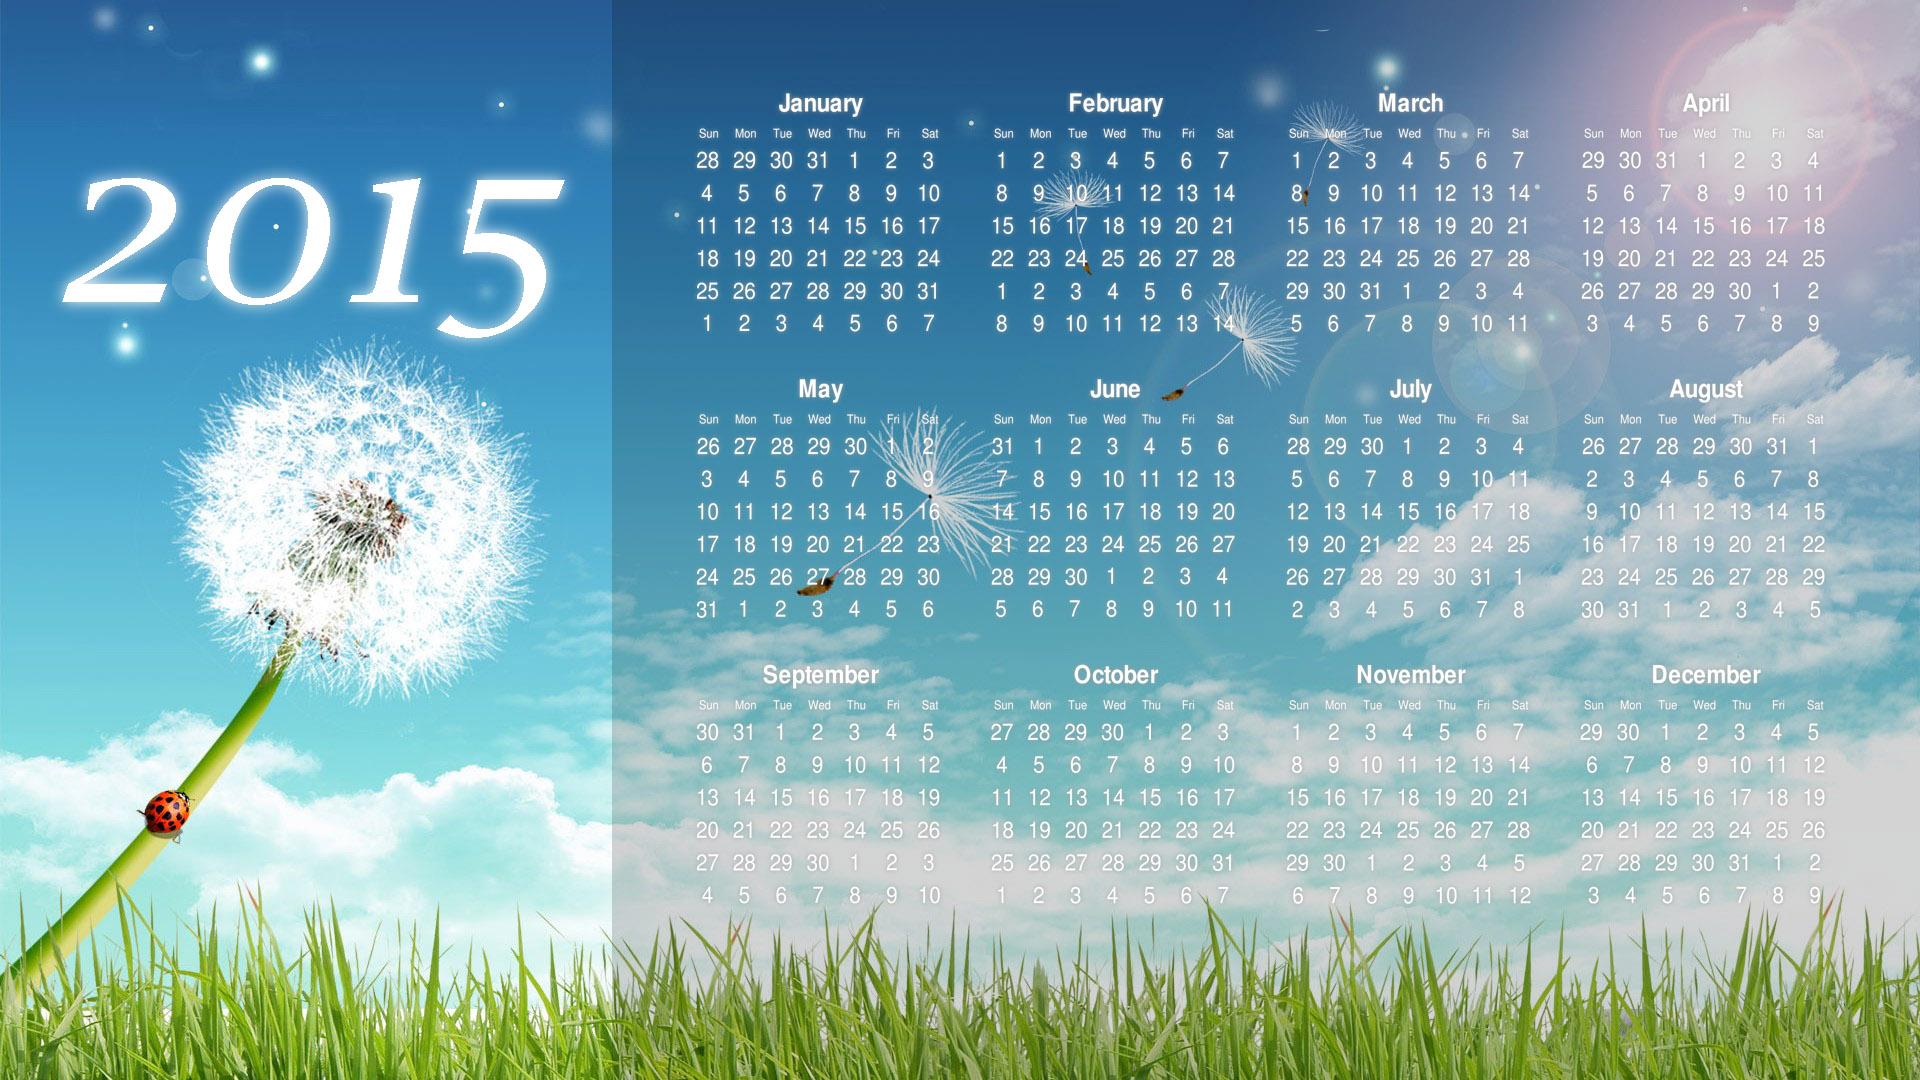 2015 Calendar HD Wallpapers Download Desktop Wallpaper Images 1920x1080